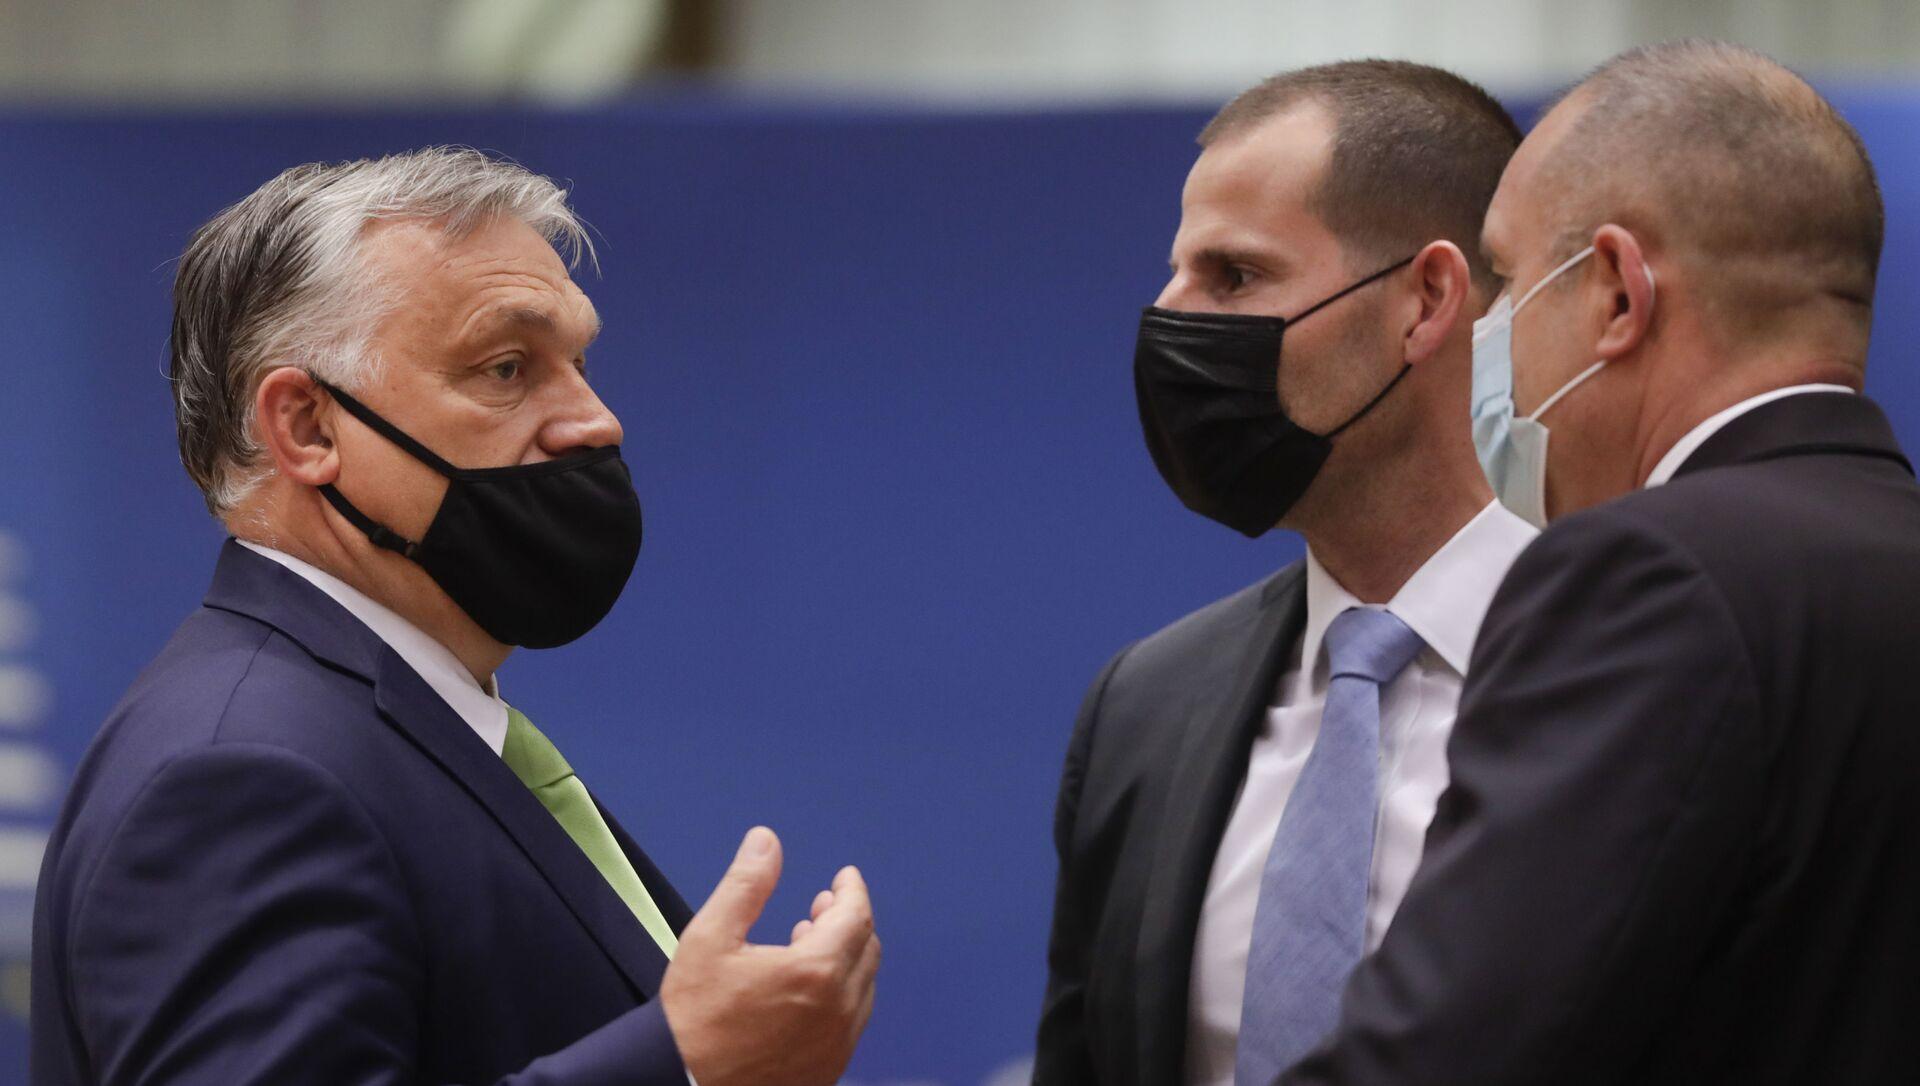 Виктор Орбан, Роберт Абела и Јанез Јанша - Sputnik Србија, 1920, 03.07.2021